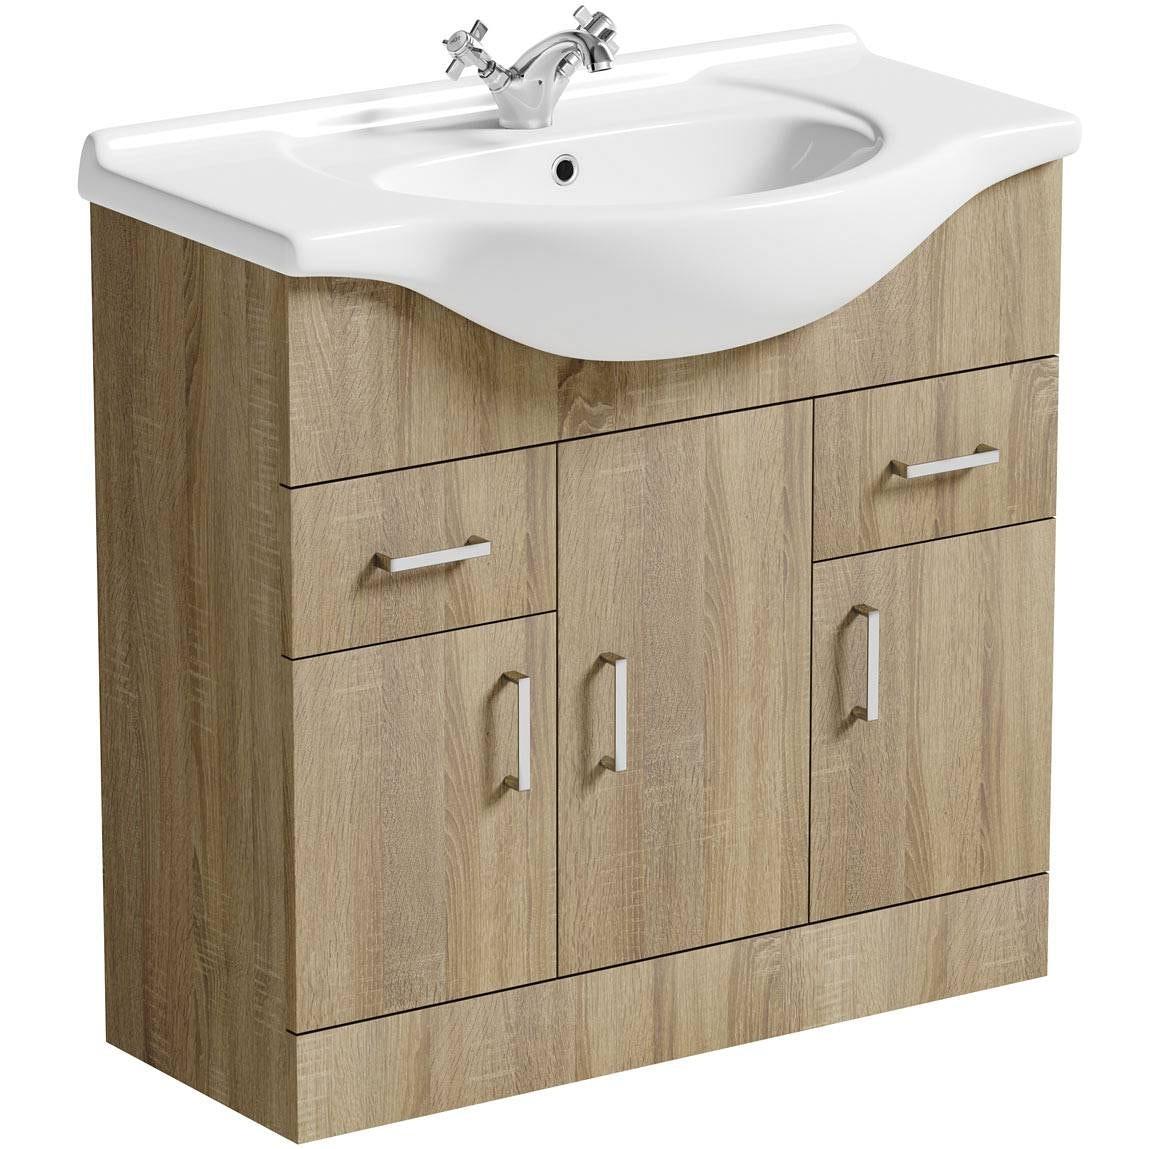 Sienna Oak 85 Vanity Unit & Basin